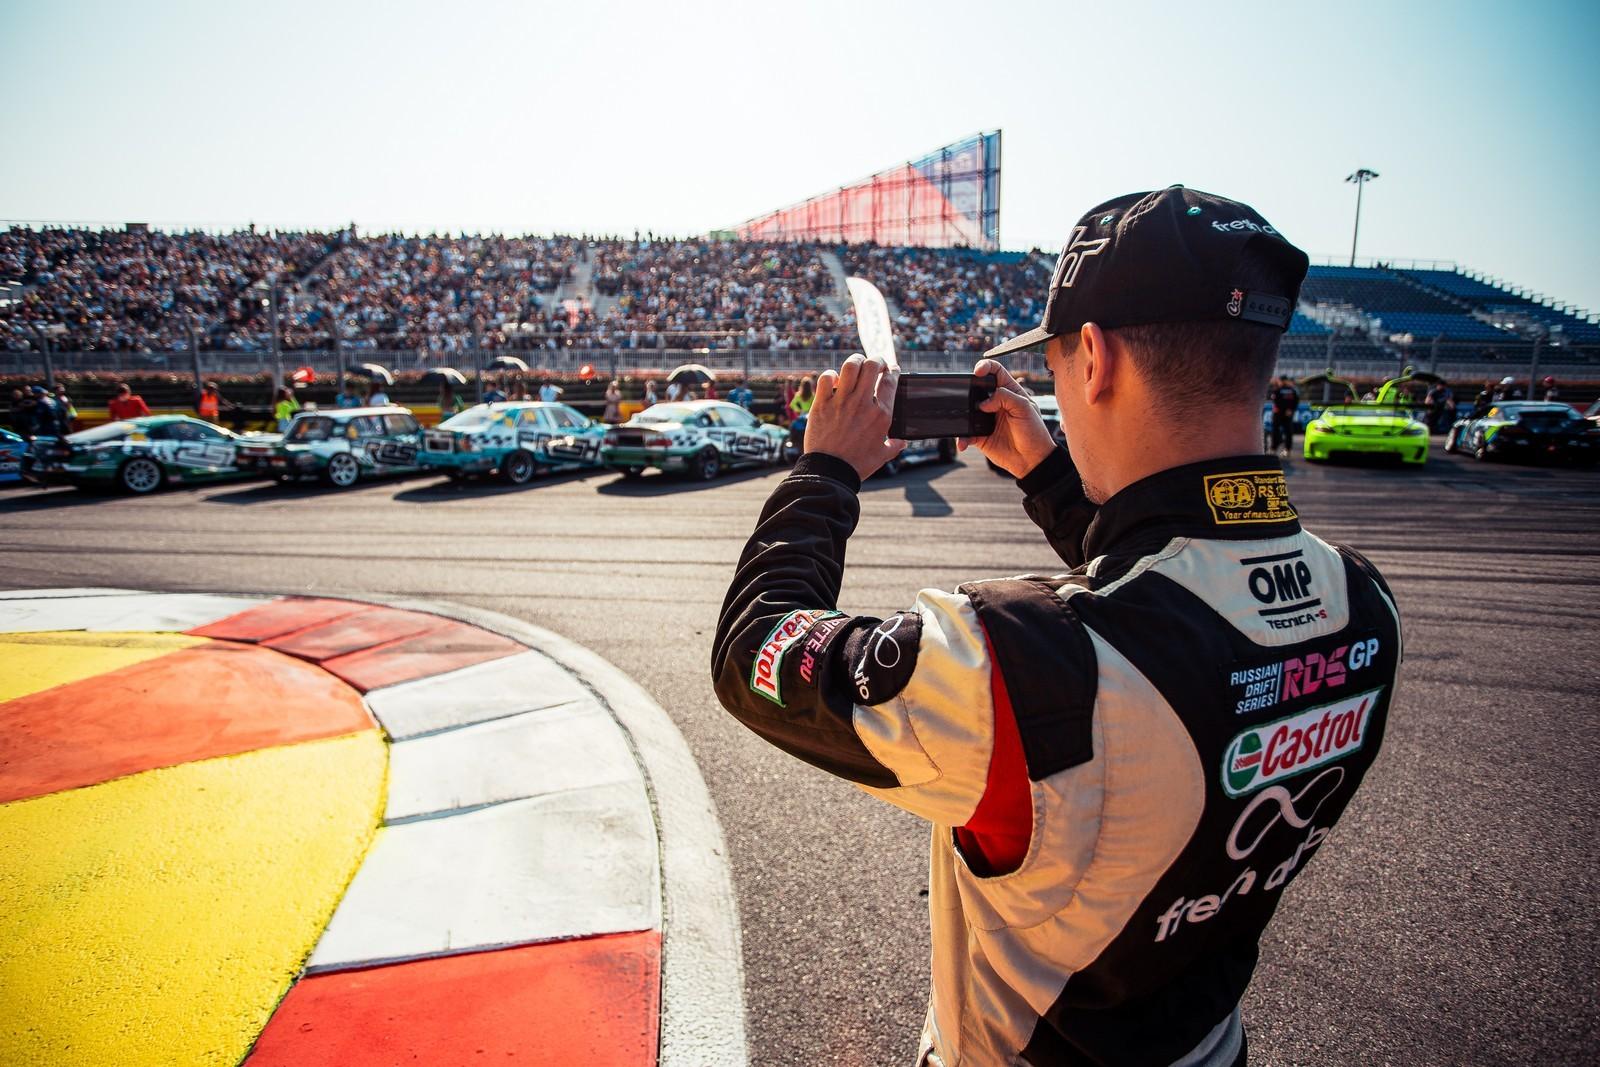 Аншлаг в Сочи: финал RDS GP 2019